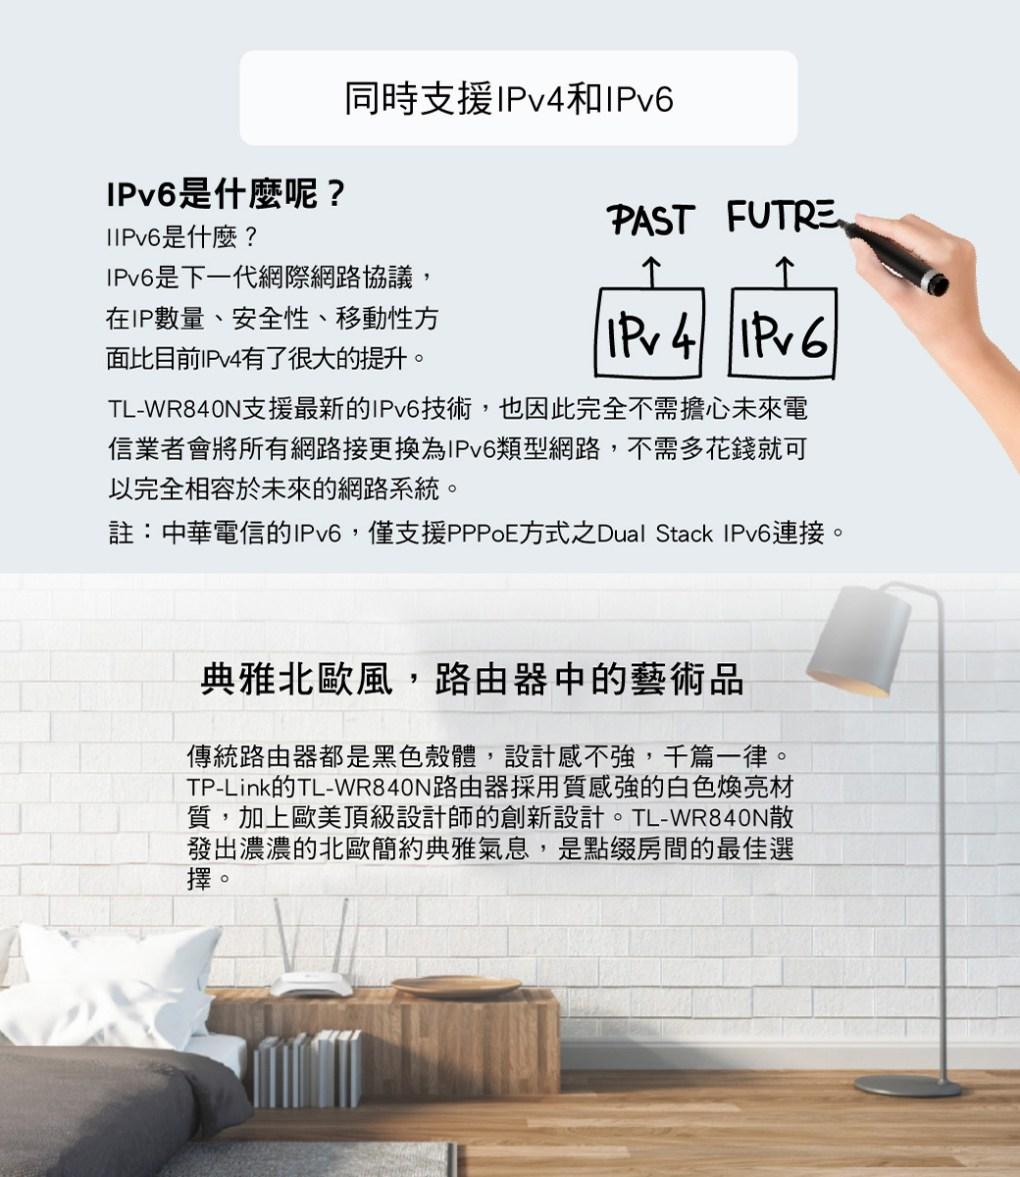 TP-Link TL-WR840N 300Mbps 無線網路 WiFi 路由器(分享器) - TP Link TL WR840N 2